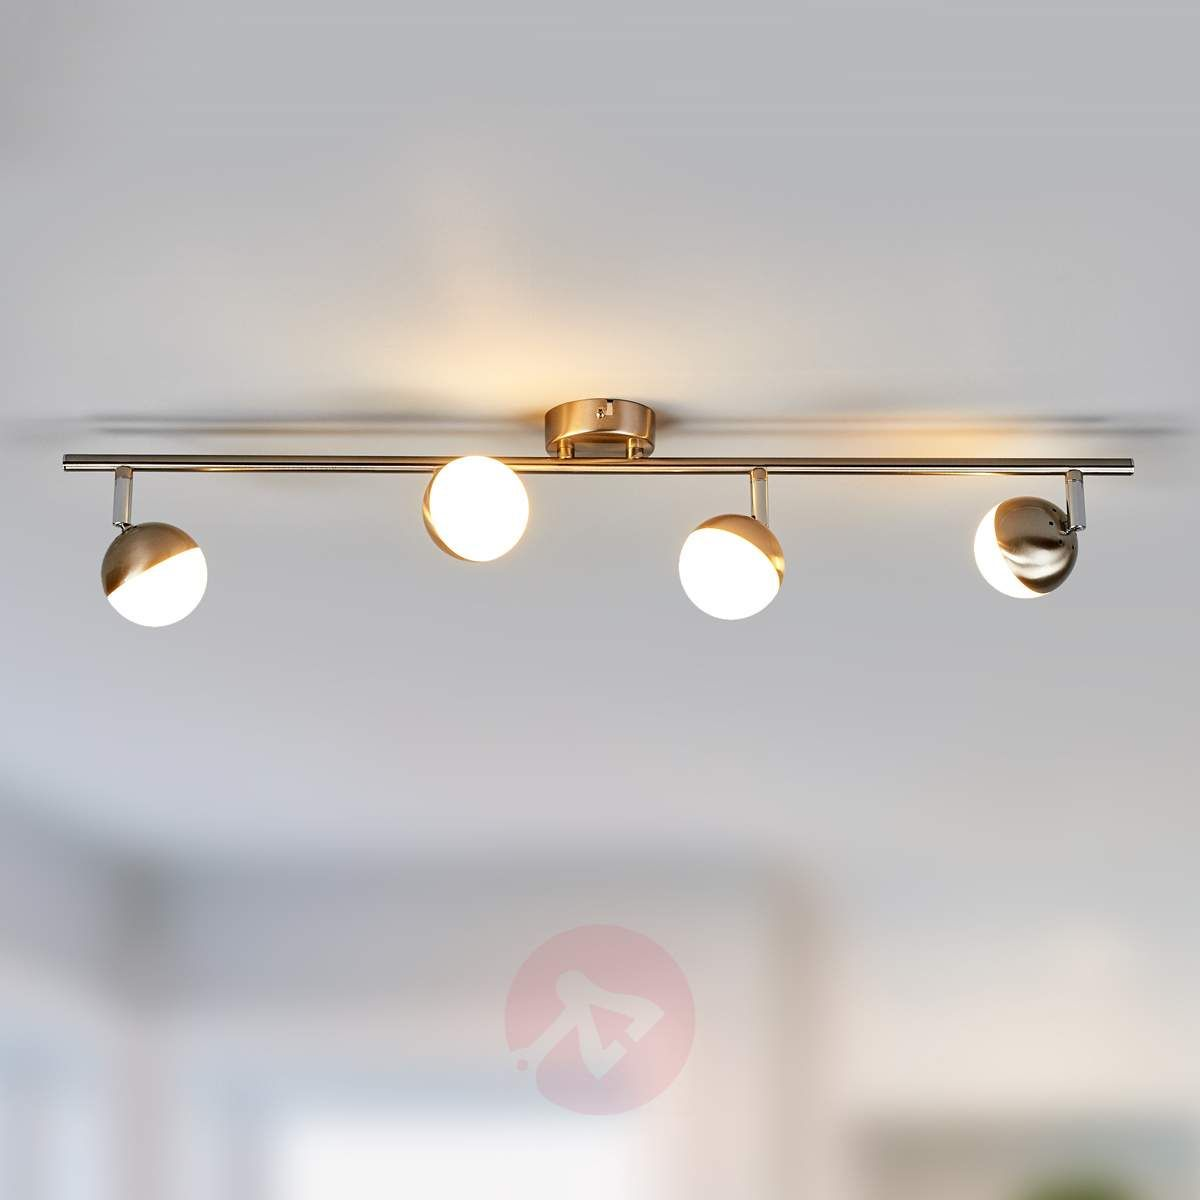 Skromna lampa sufitowa LED Jonne, nikiel matowy | Taklampa